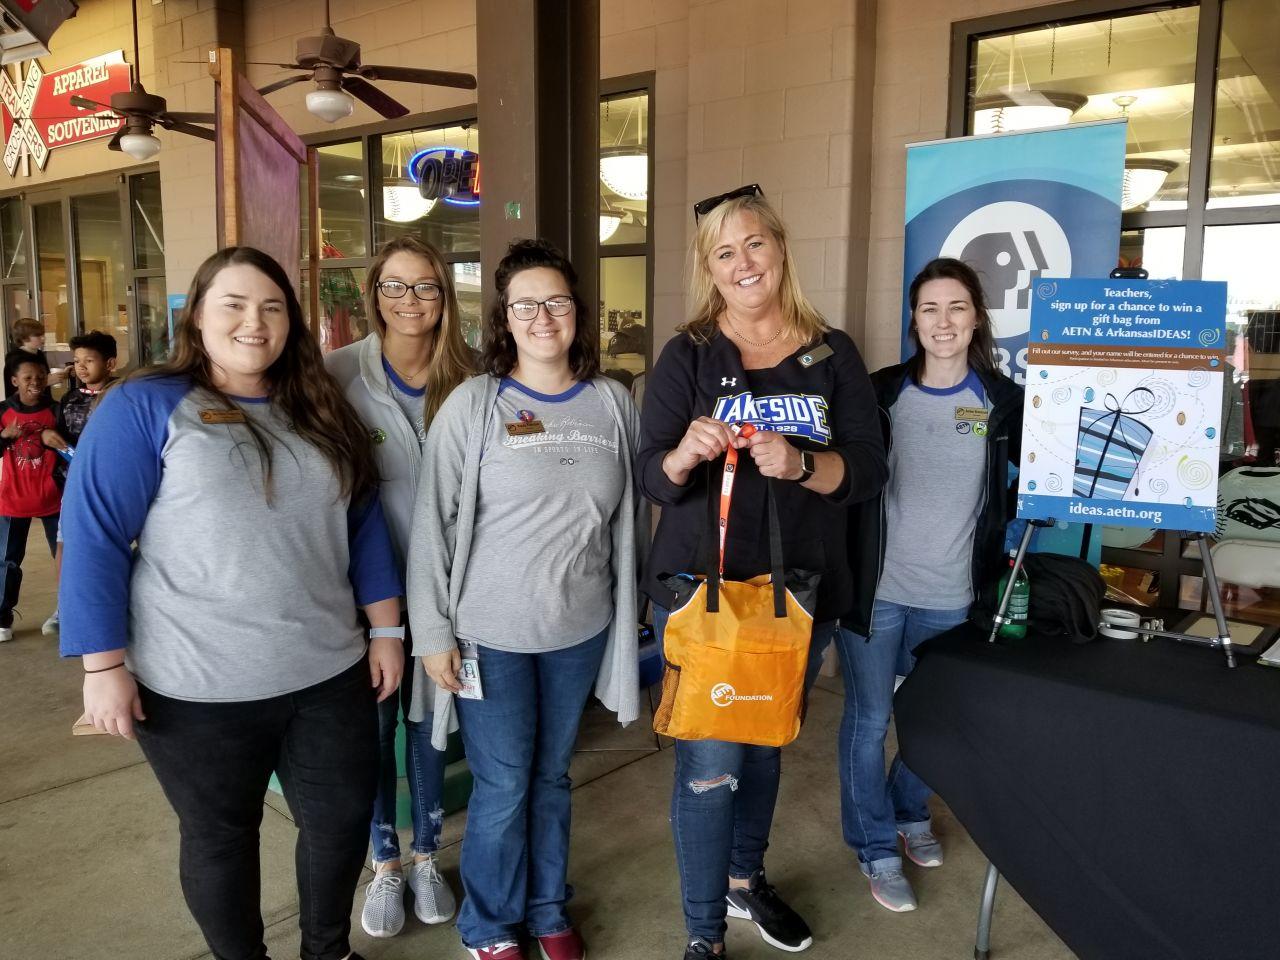 ArkansasIDEAS Door Prize Winner 2